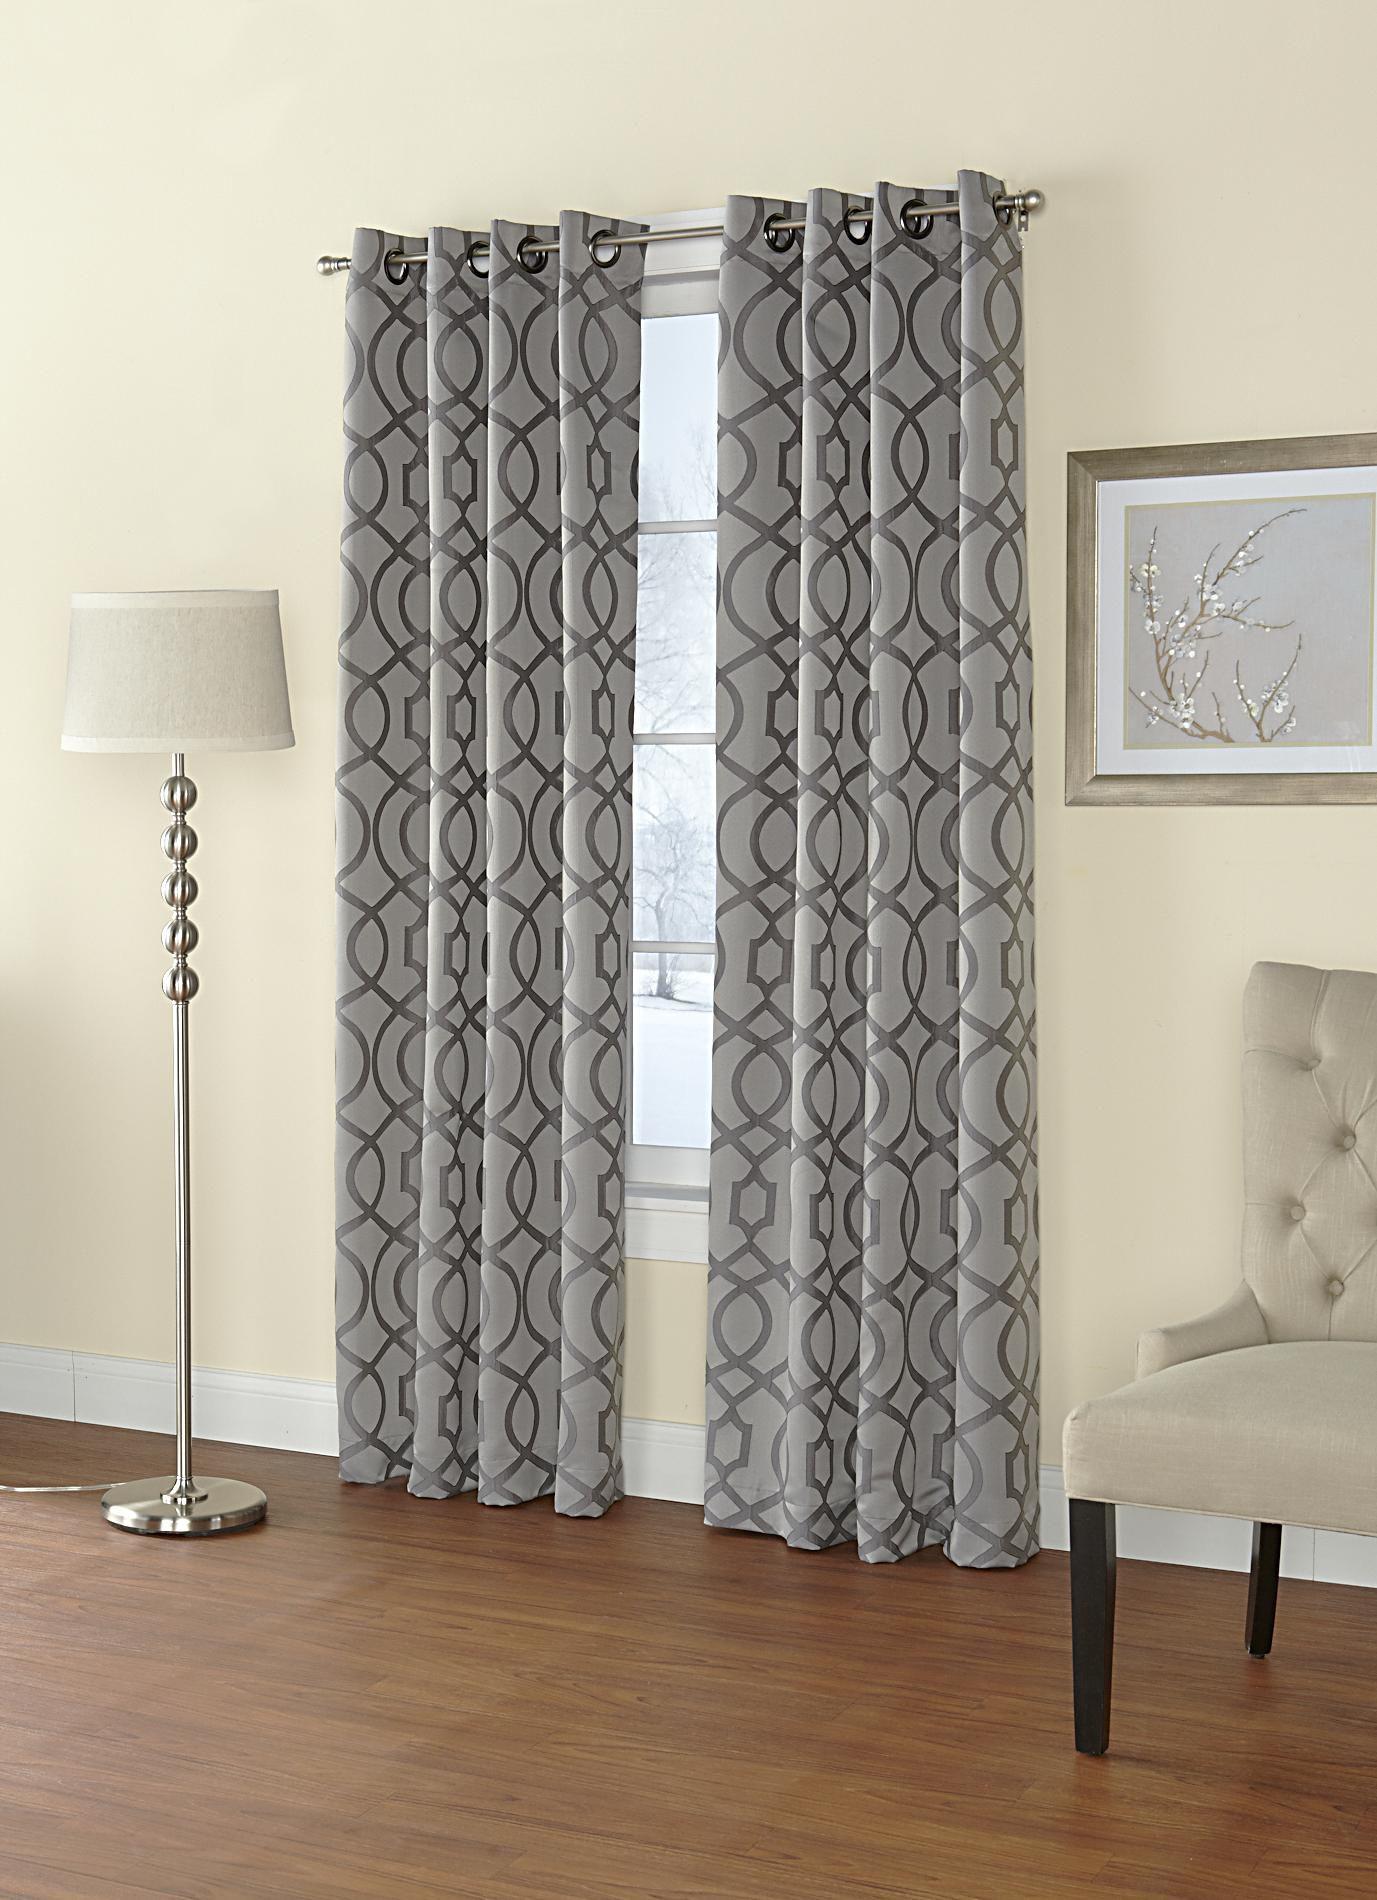 Regal Home Jacquard Grommet Top Single Curtain Panel Home Home Decor Window Treatments